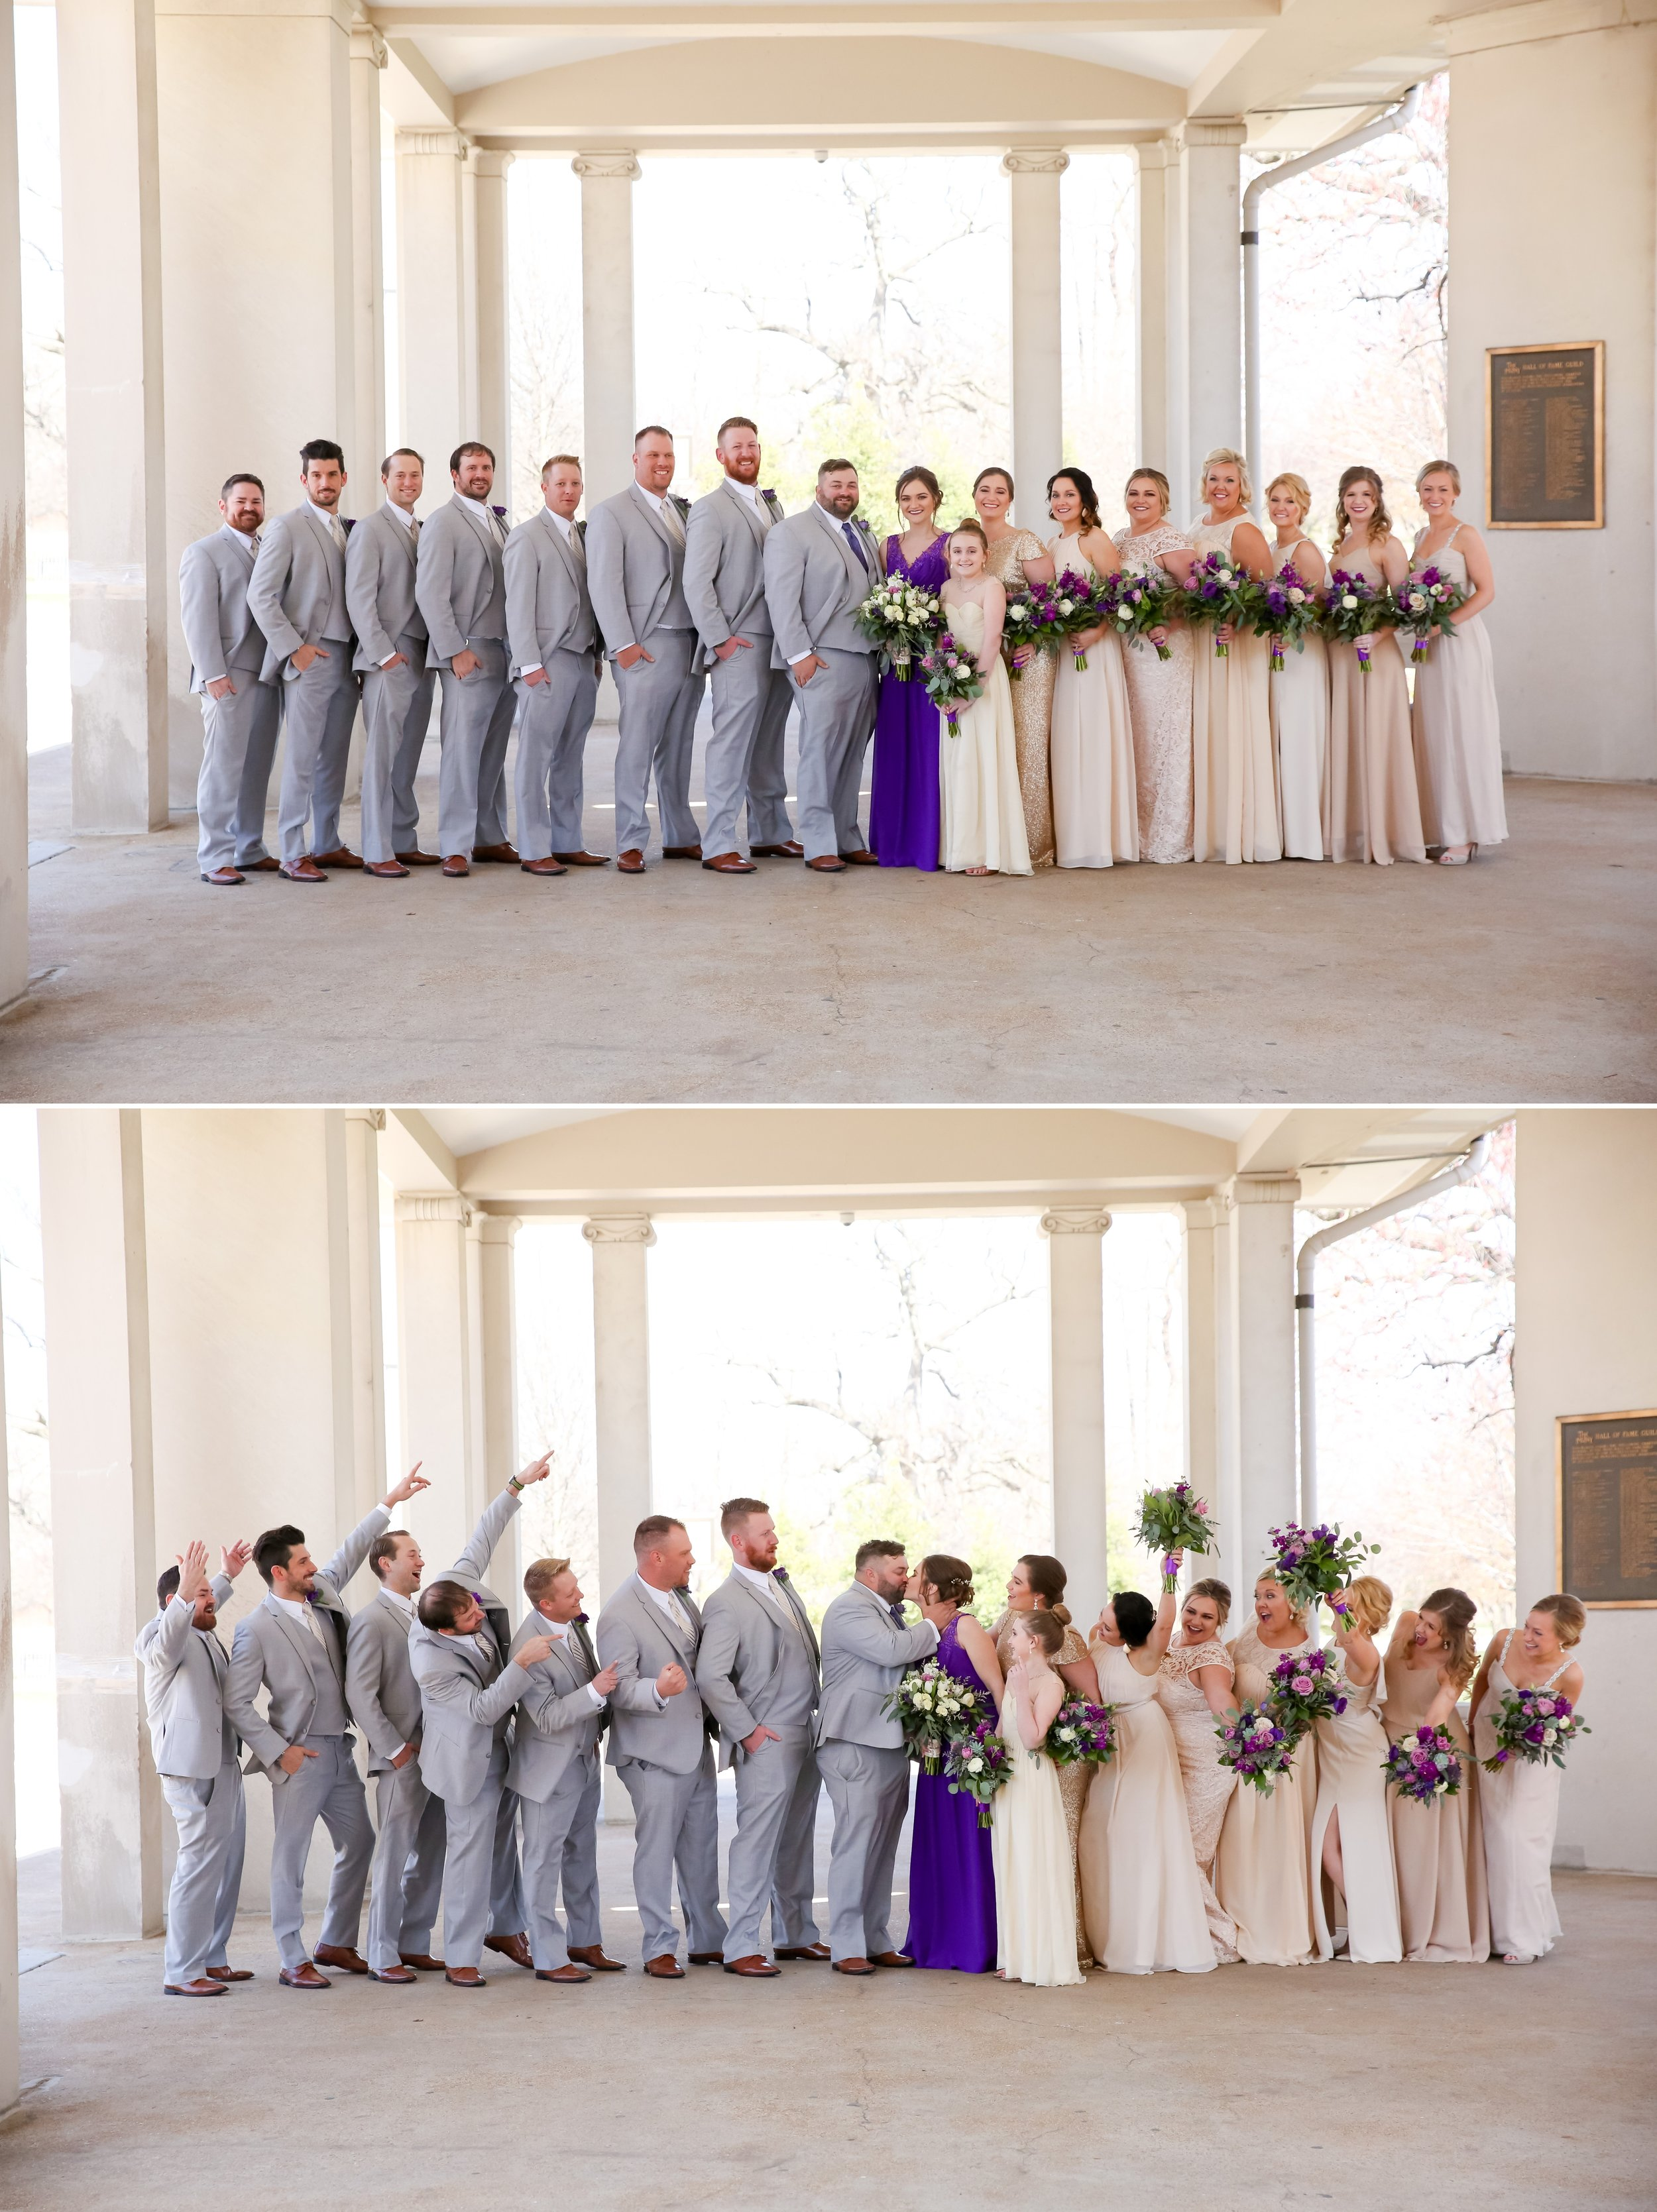 cleary wedding 15.jpg